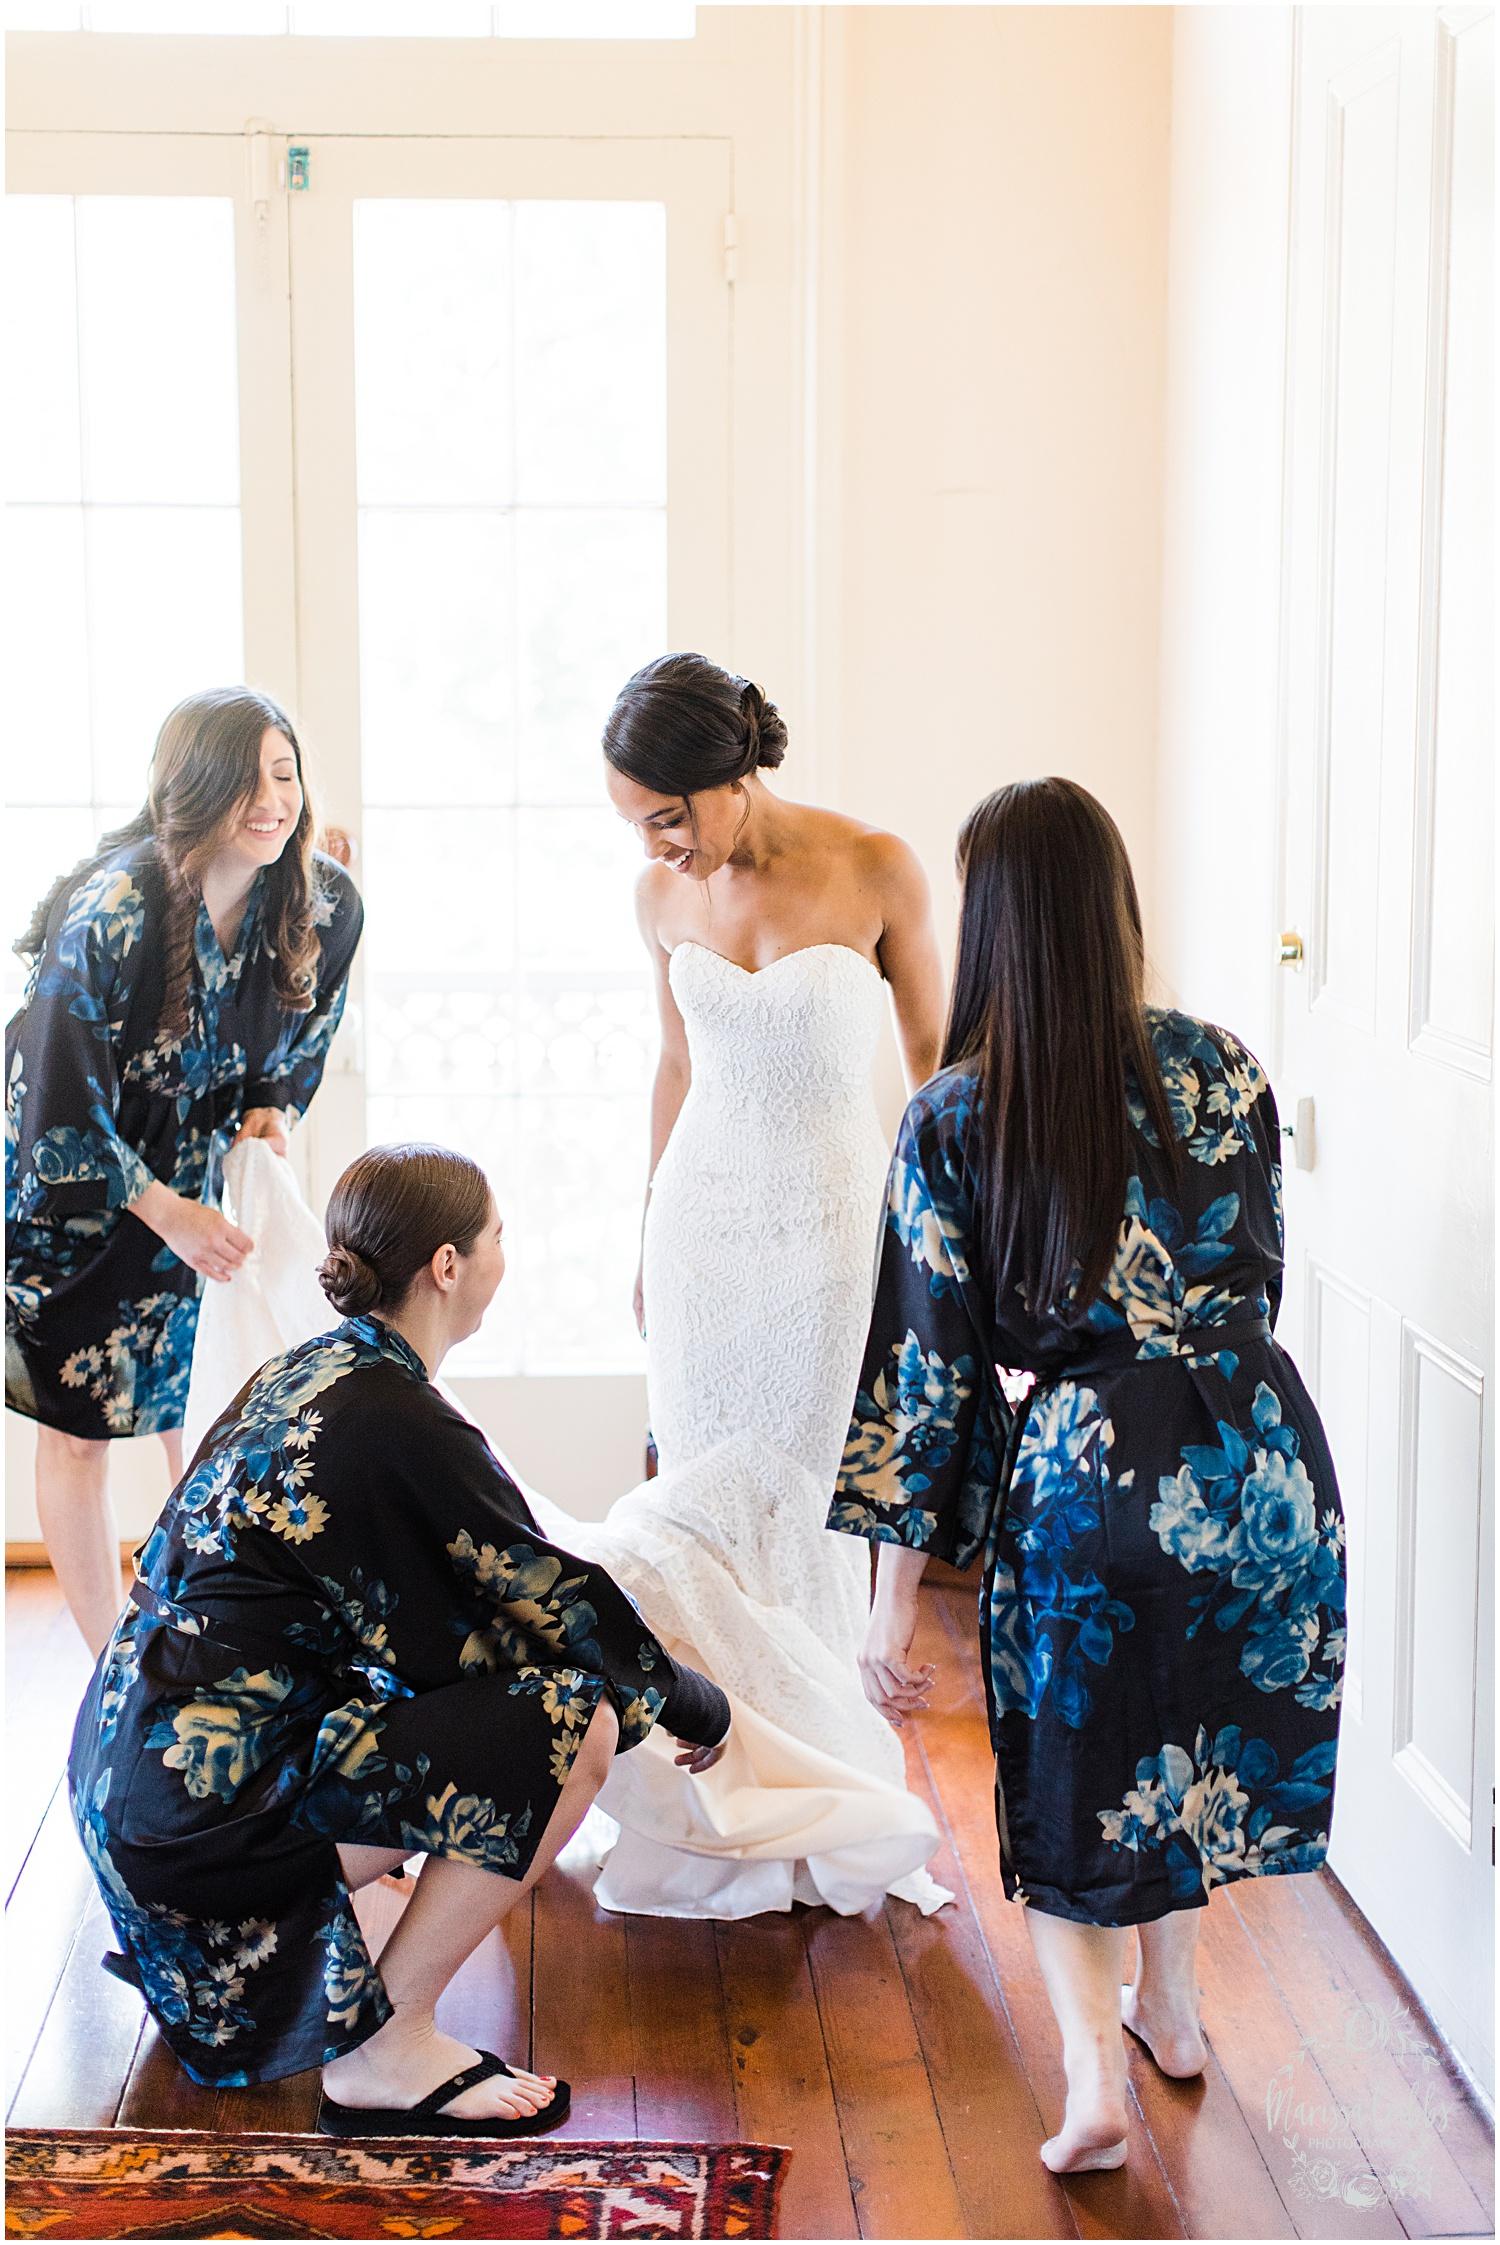 NEW ORLEANS WEDDING   BENACHI HOUSE   SARAH & MICHAEL   MARISSA CRIBBS PHOTOGRAPHY_4394.jpg